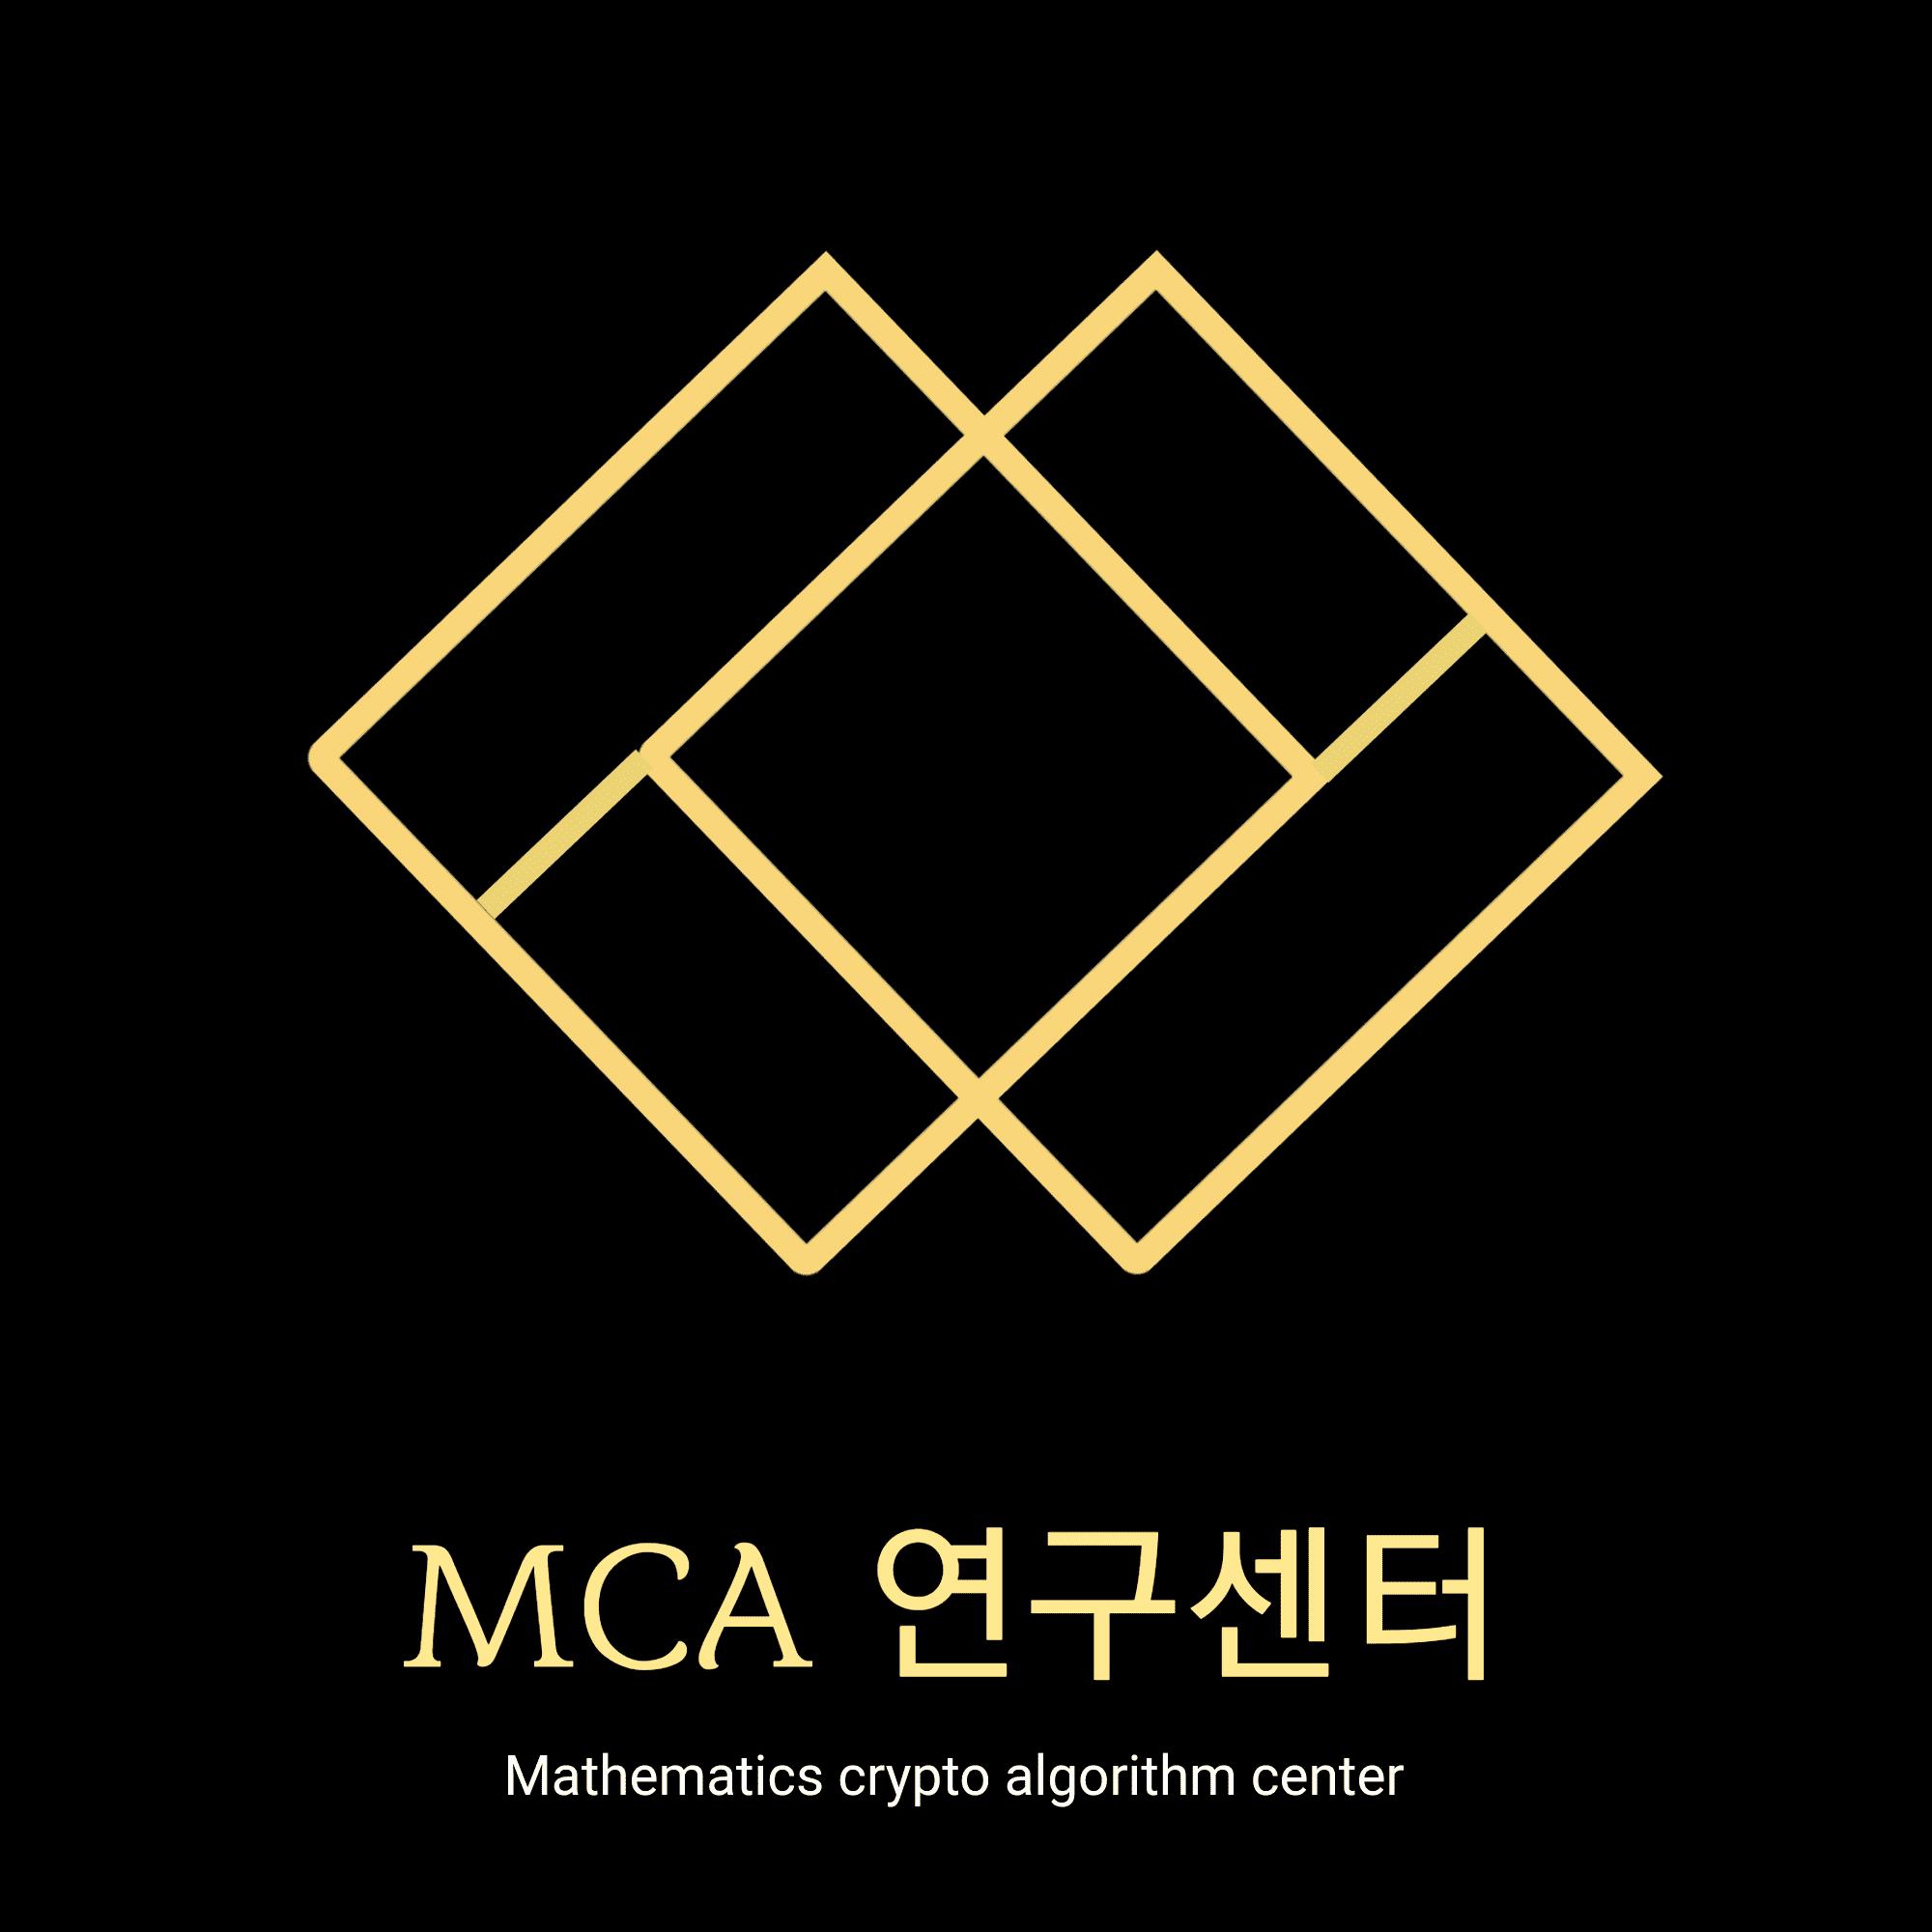 MCA 연구센터의 썸네일